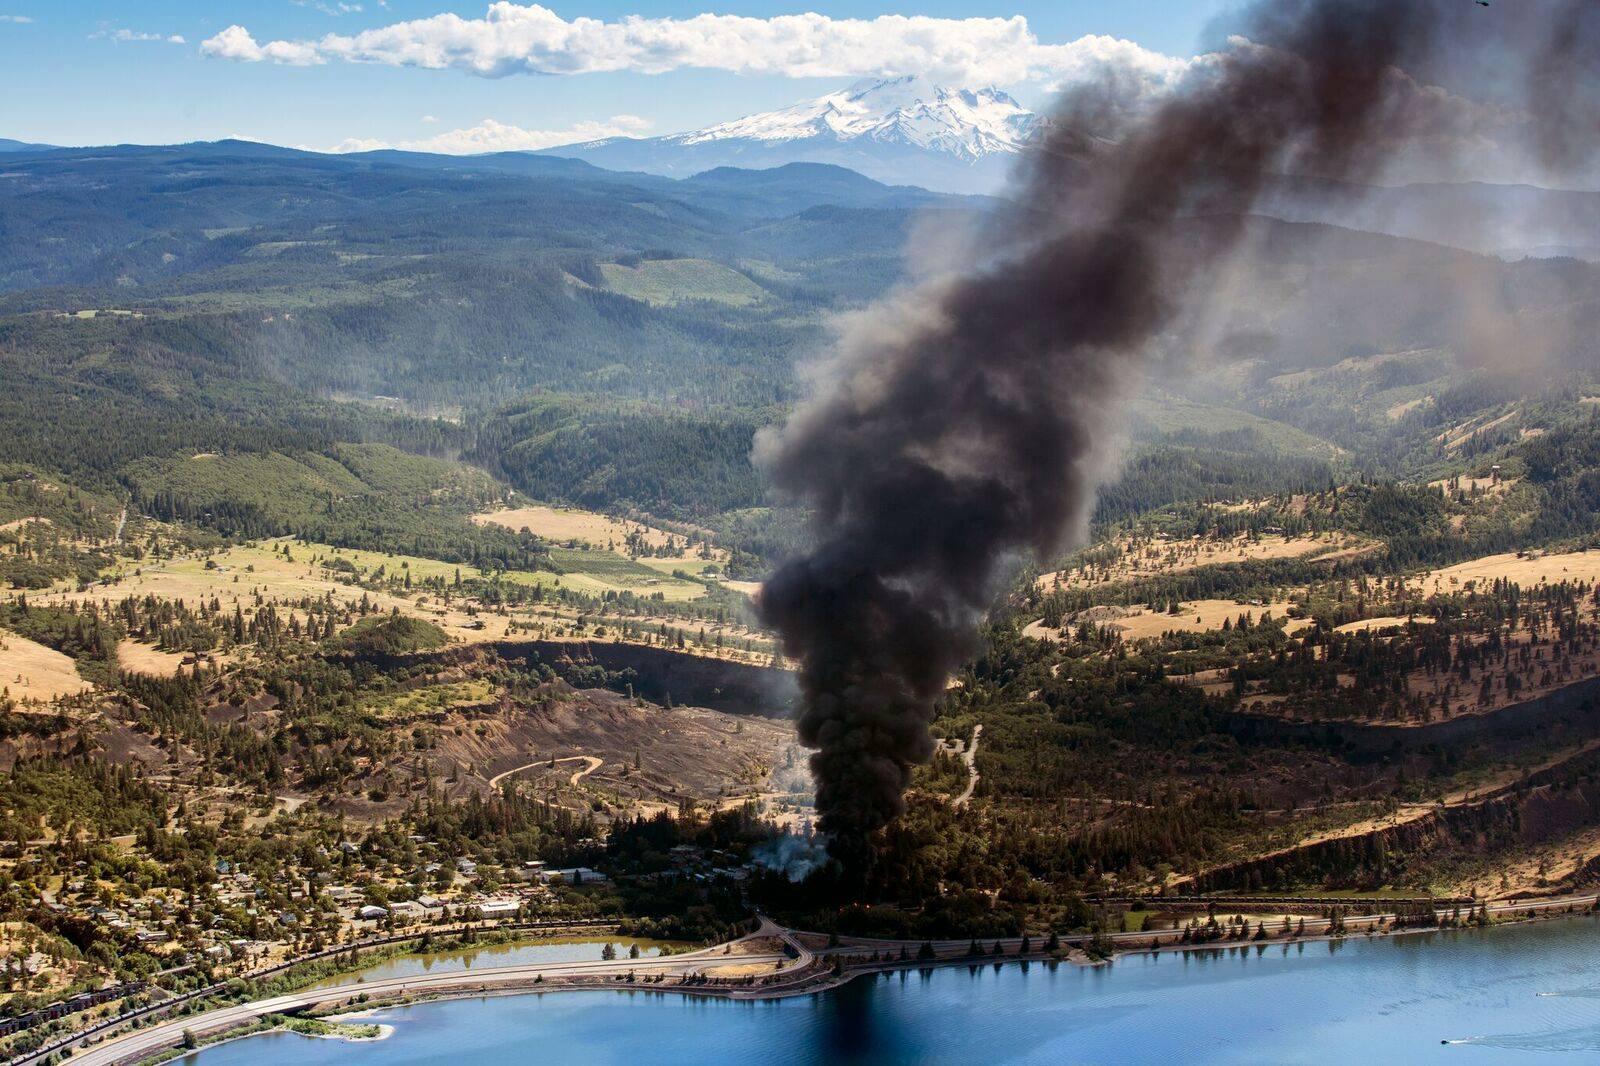 mosier explosion smoke plume